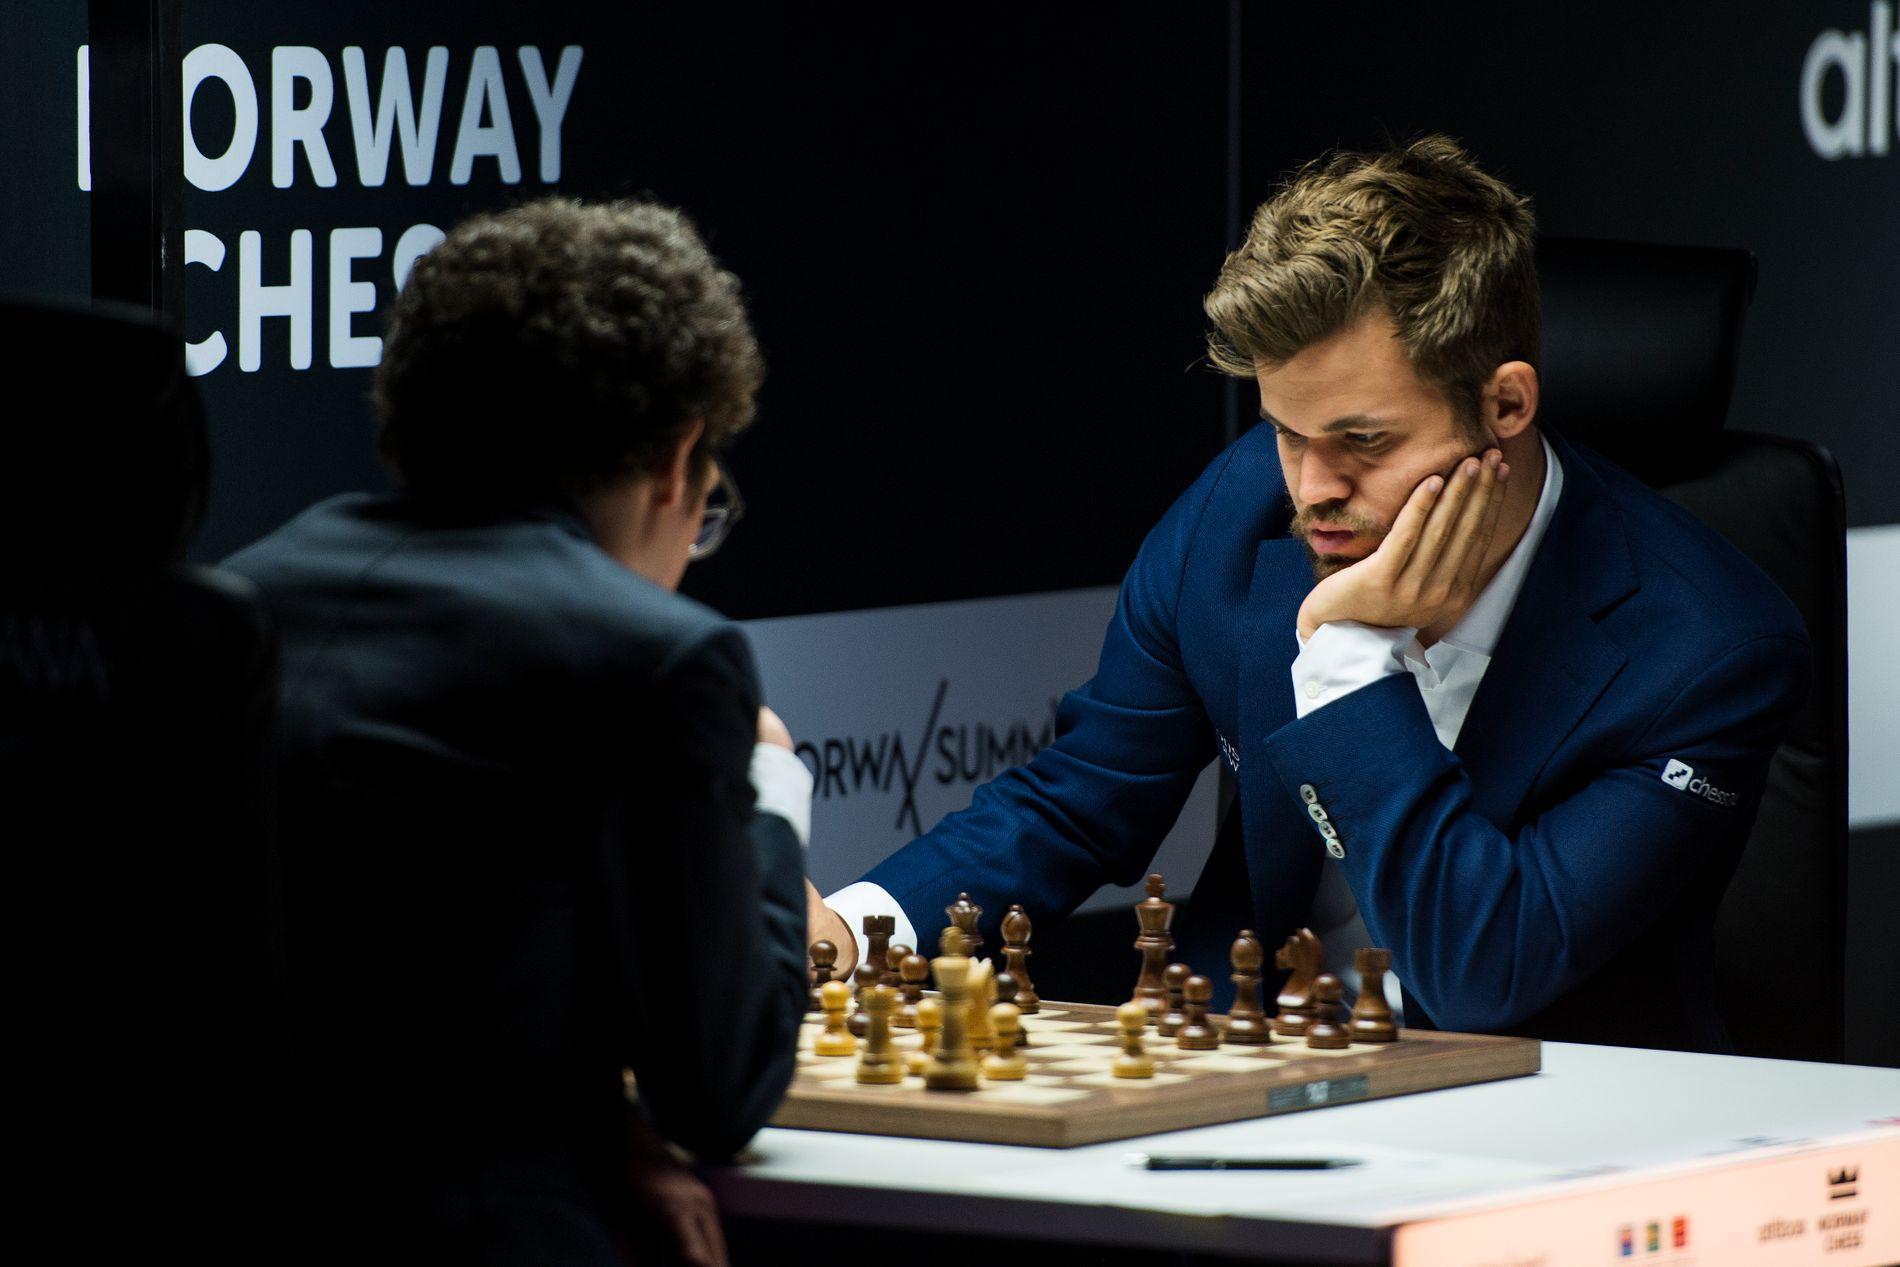 MISTET RANKINGTOPP: Magnus Carlsen i kamp mot Fabiano Caruana i Stavanger i juni.